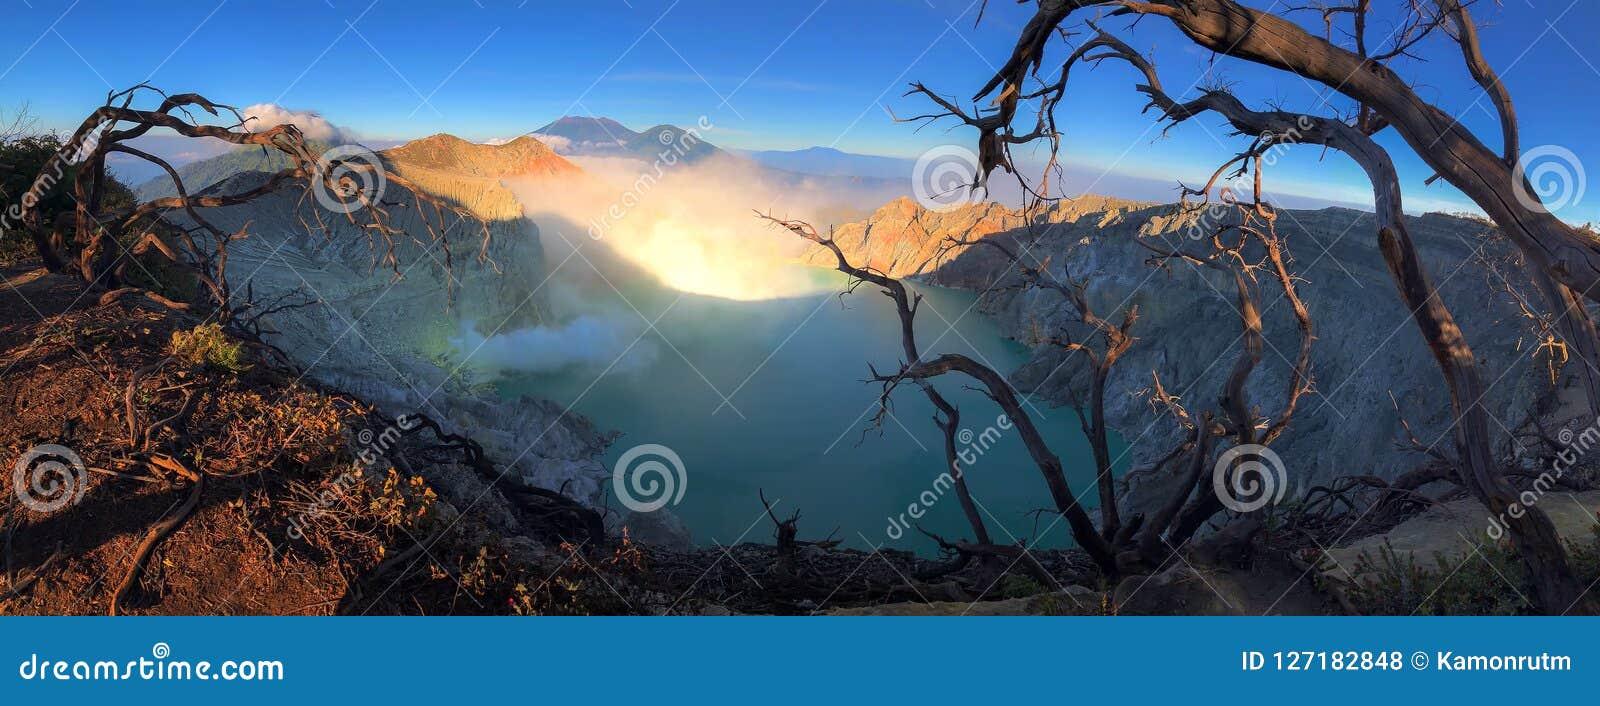 Kawah Ijen at Sunrise.